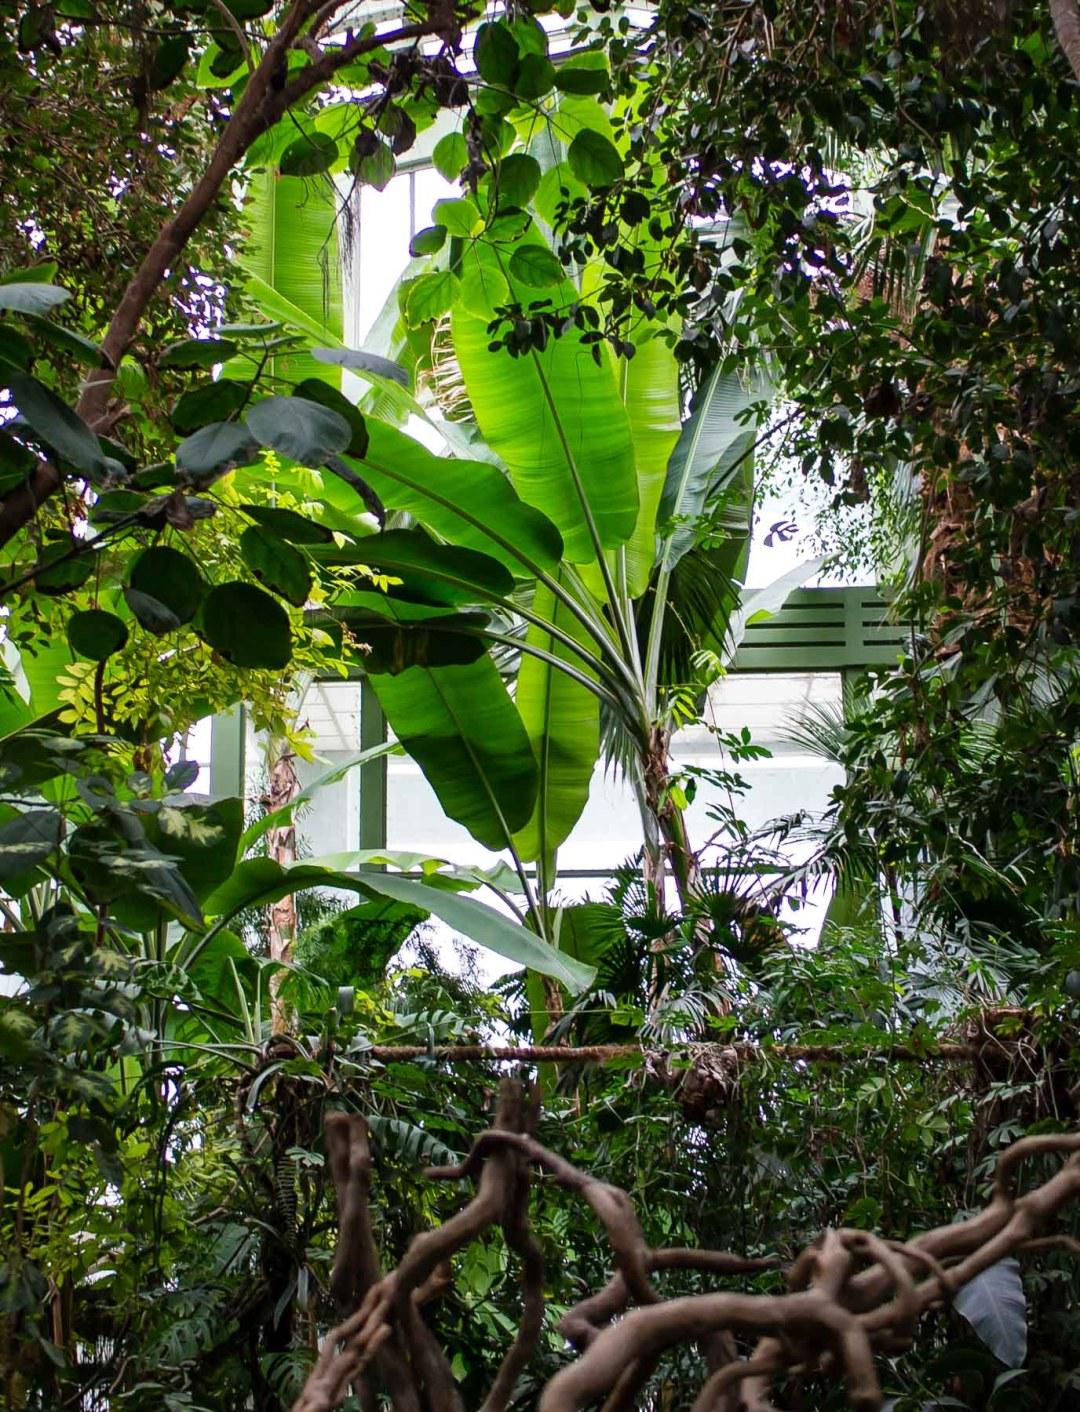 Les Grandes Serres (Grand Greenhouses & Botanical Garden)